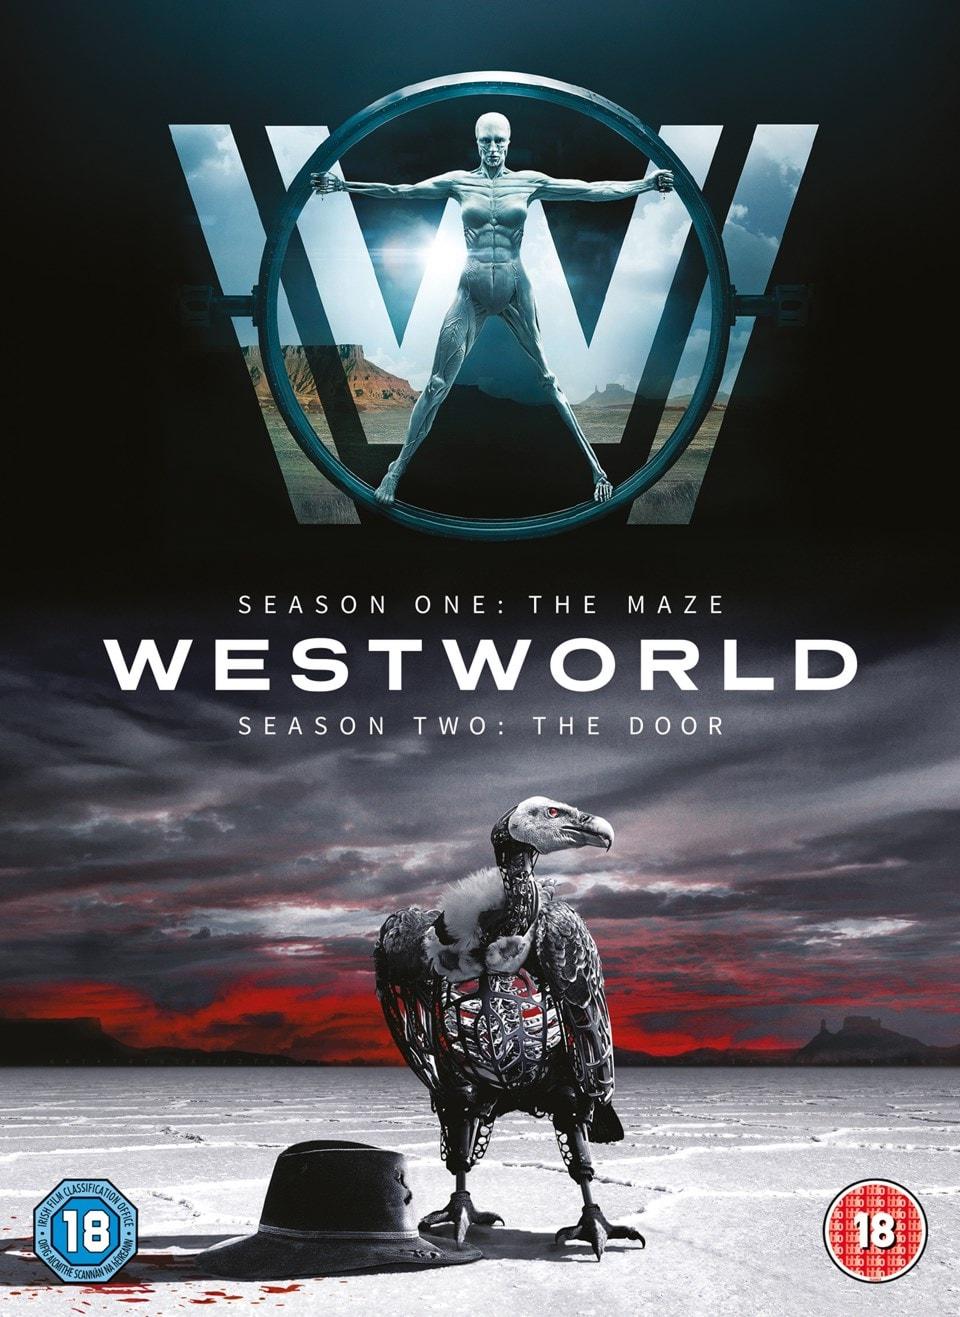 Westworld: Seasons One - The Maze/ Season Two - The Door - 1